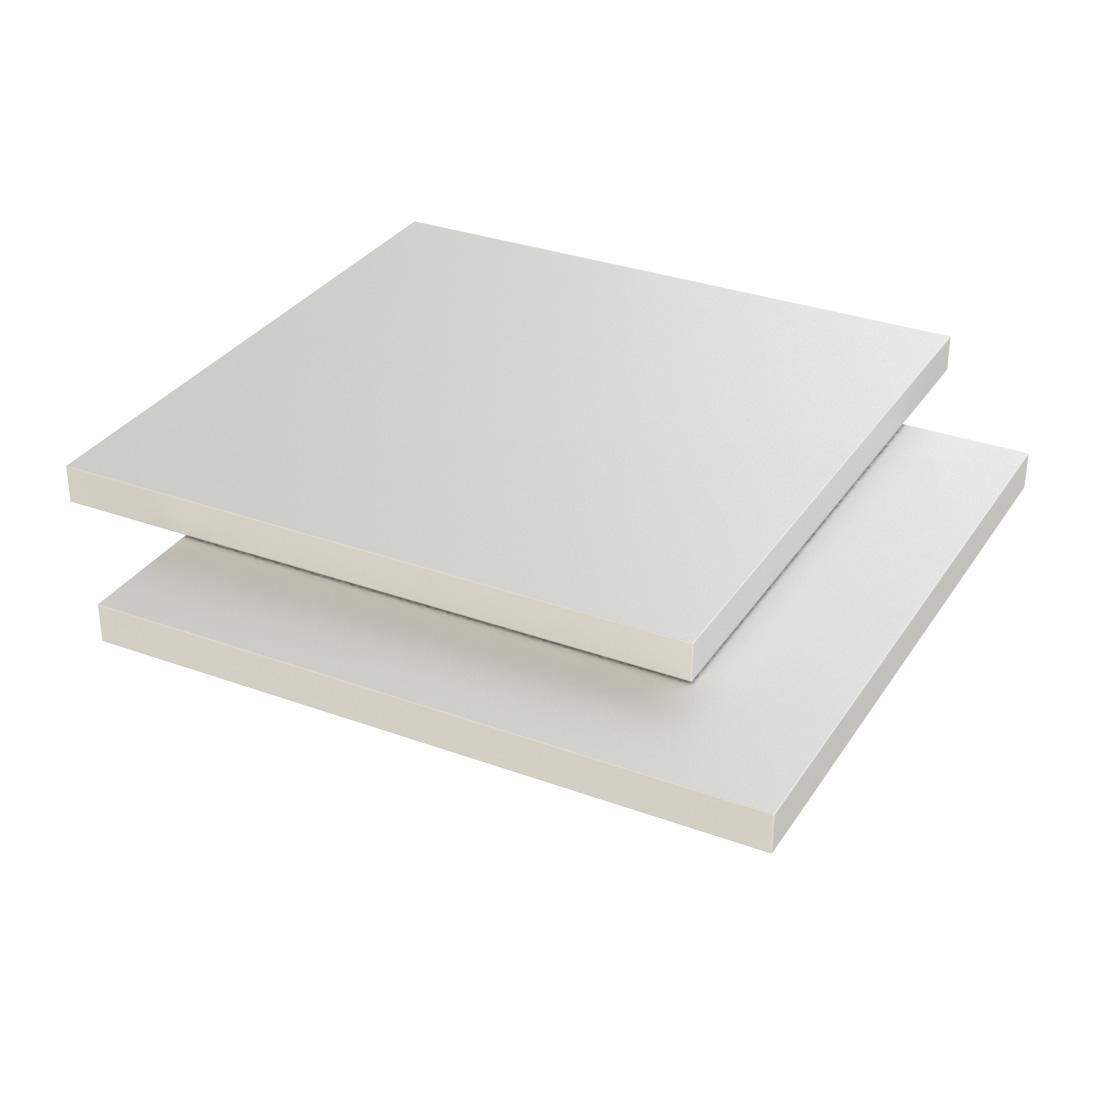 Vikunyl PVC Plaat MZ XT Wit 656 Enkelzijdig folie Hoogslagvast 2000x1000x1mm